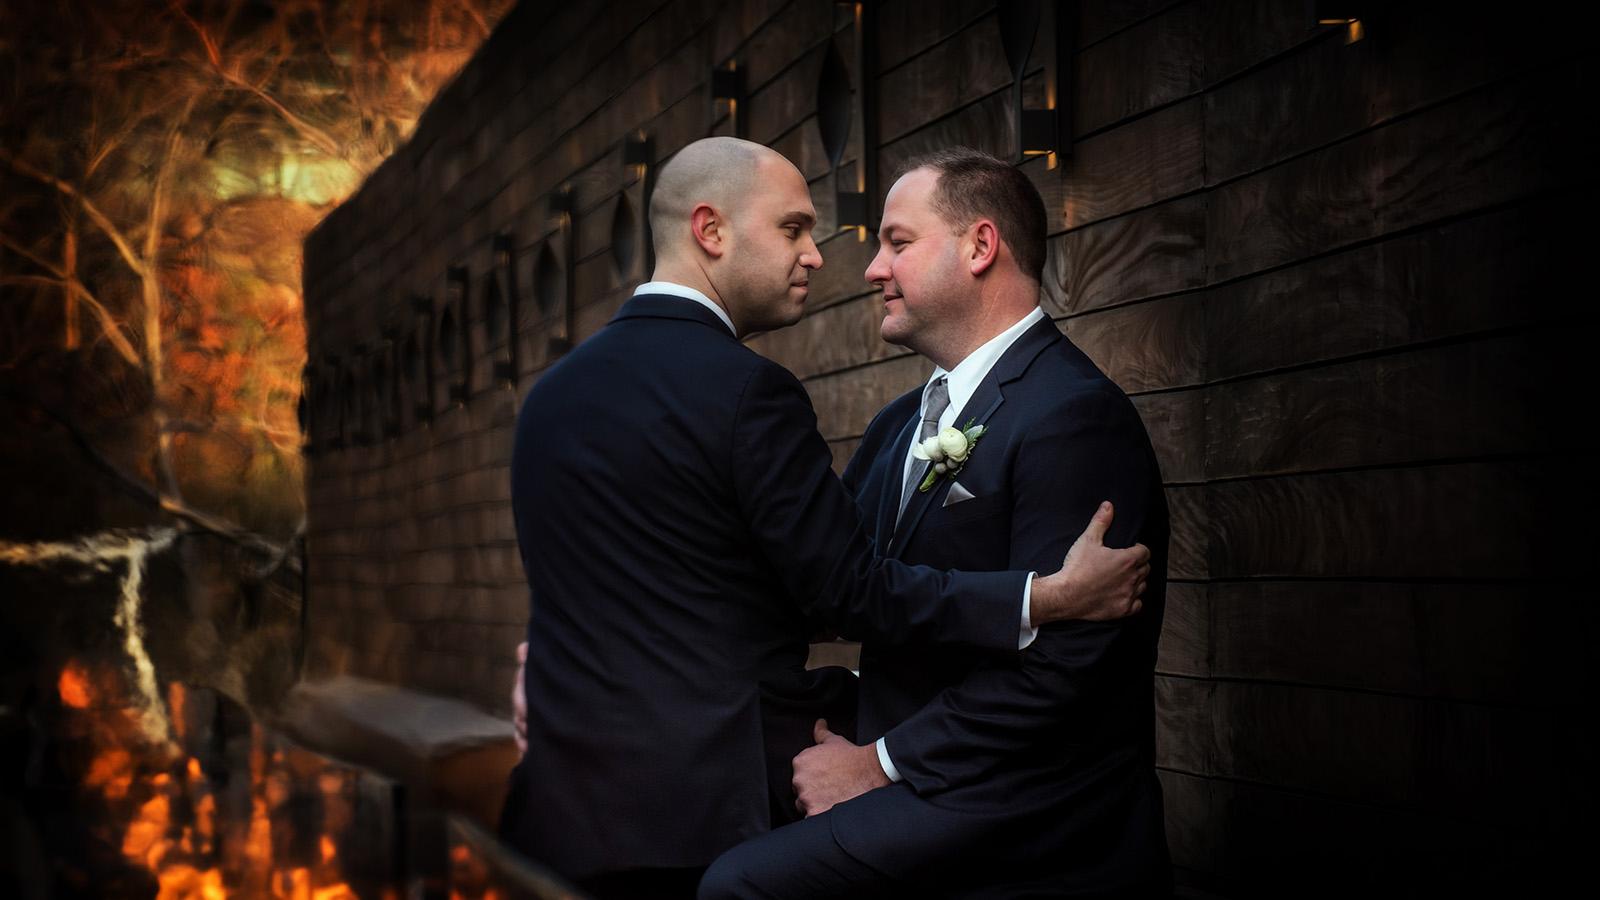 Gay Wedding Grooms Wedding Portrait